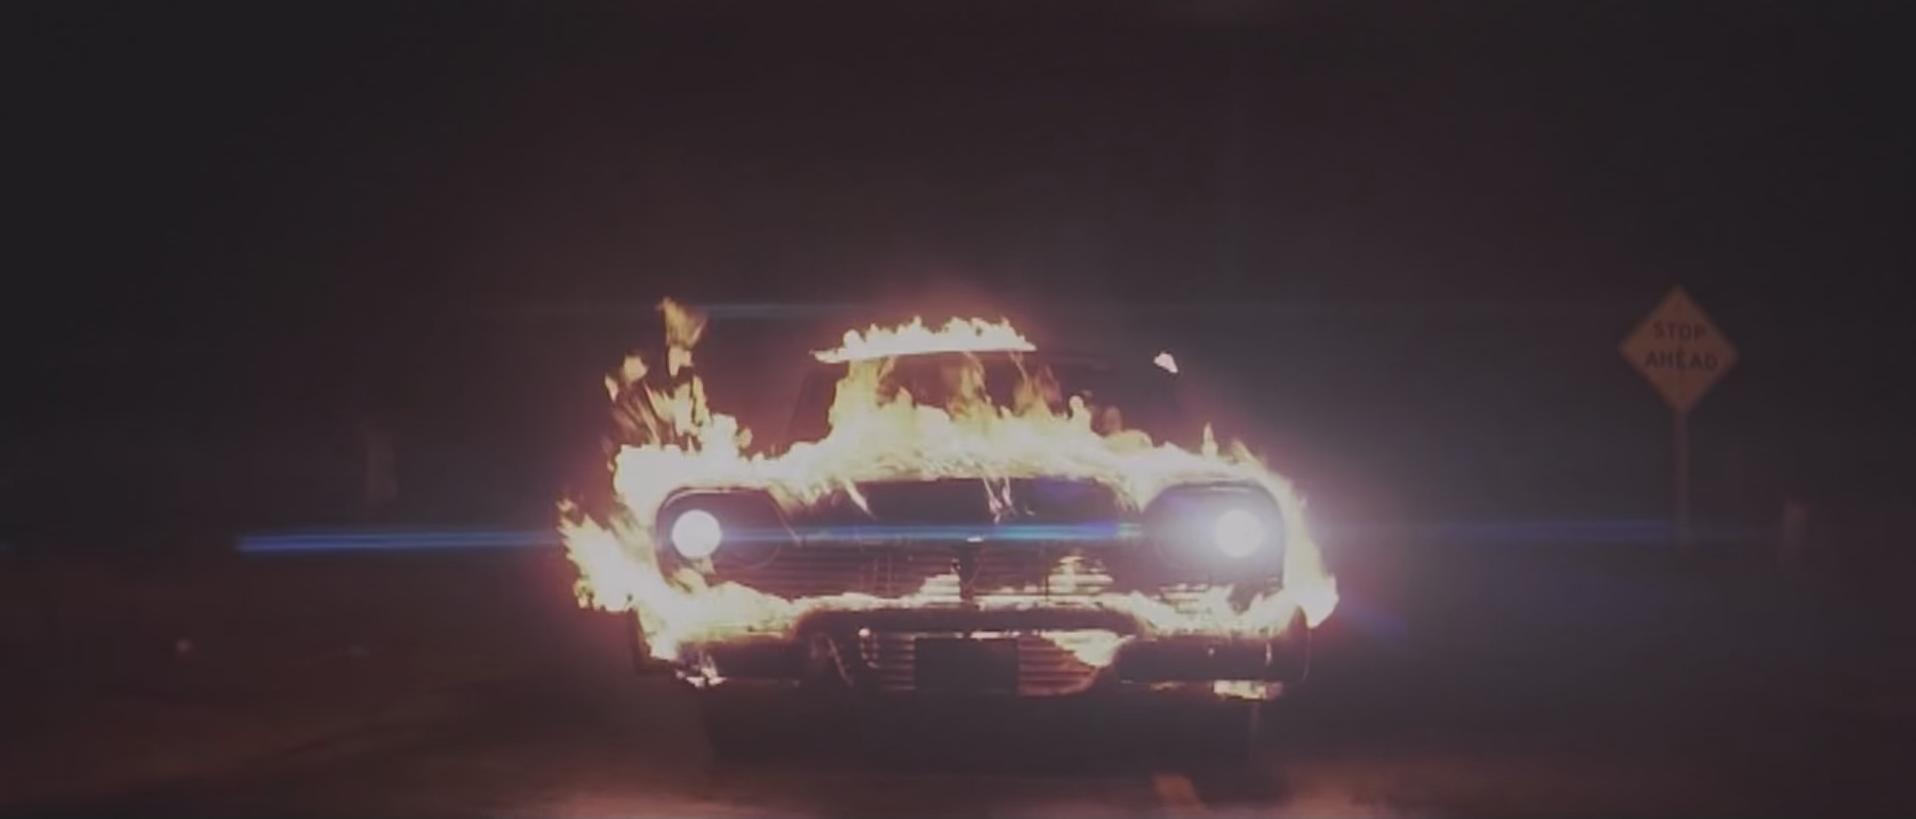 Christine on fire